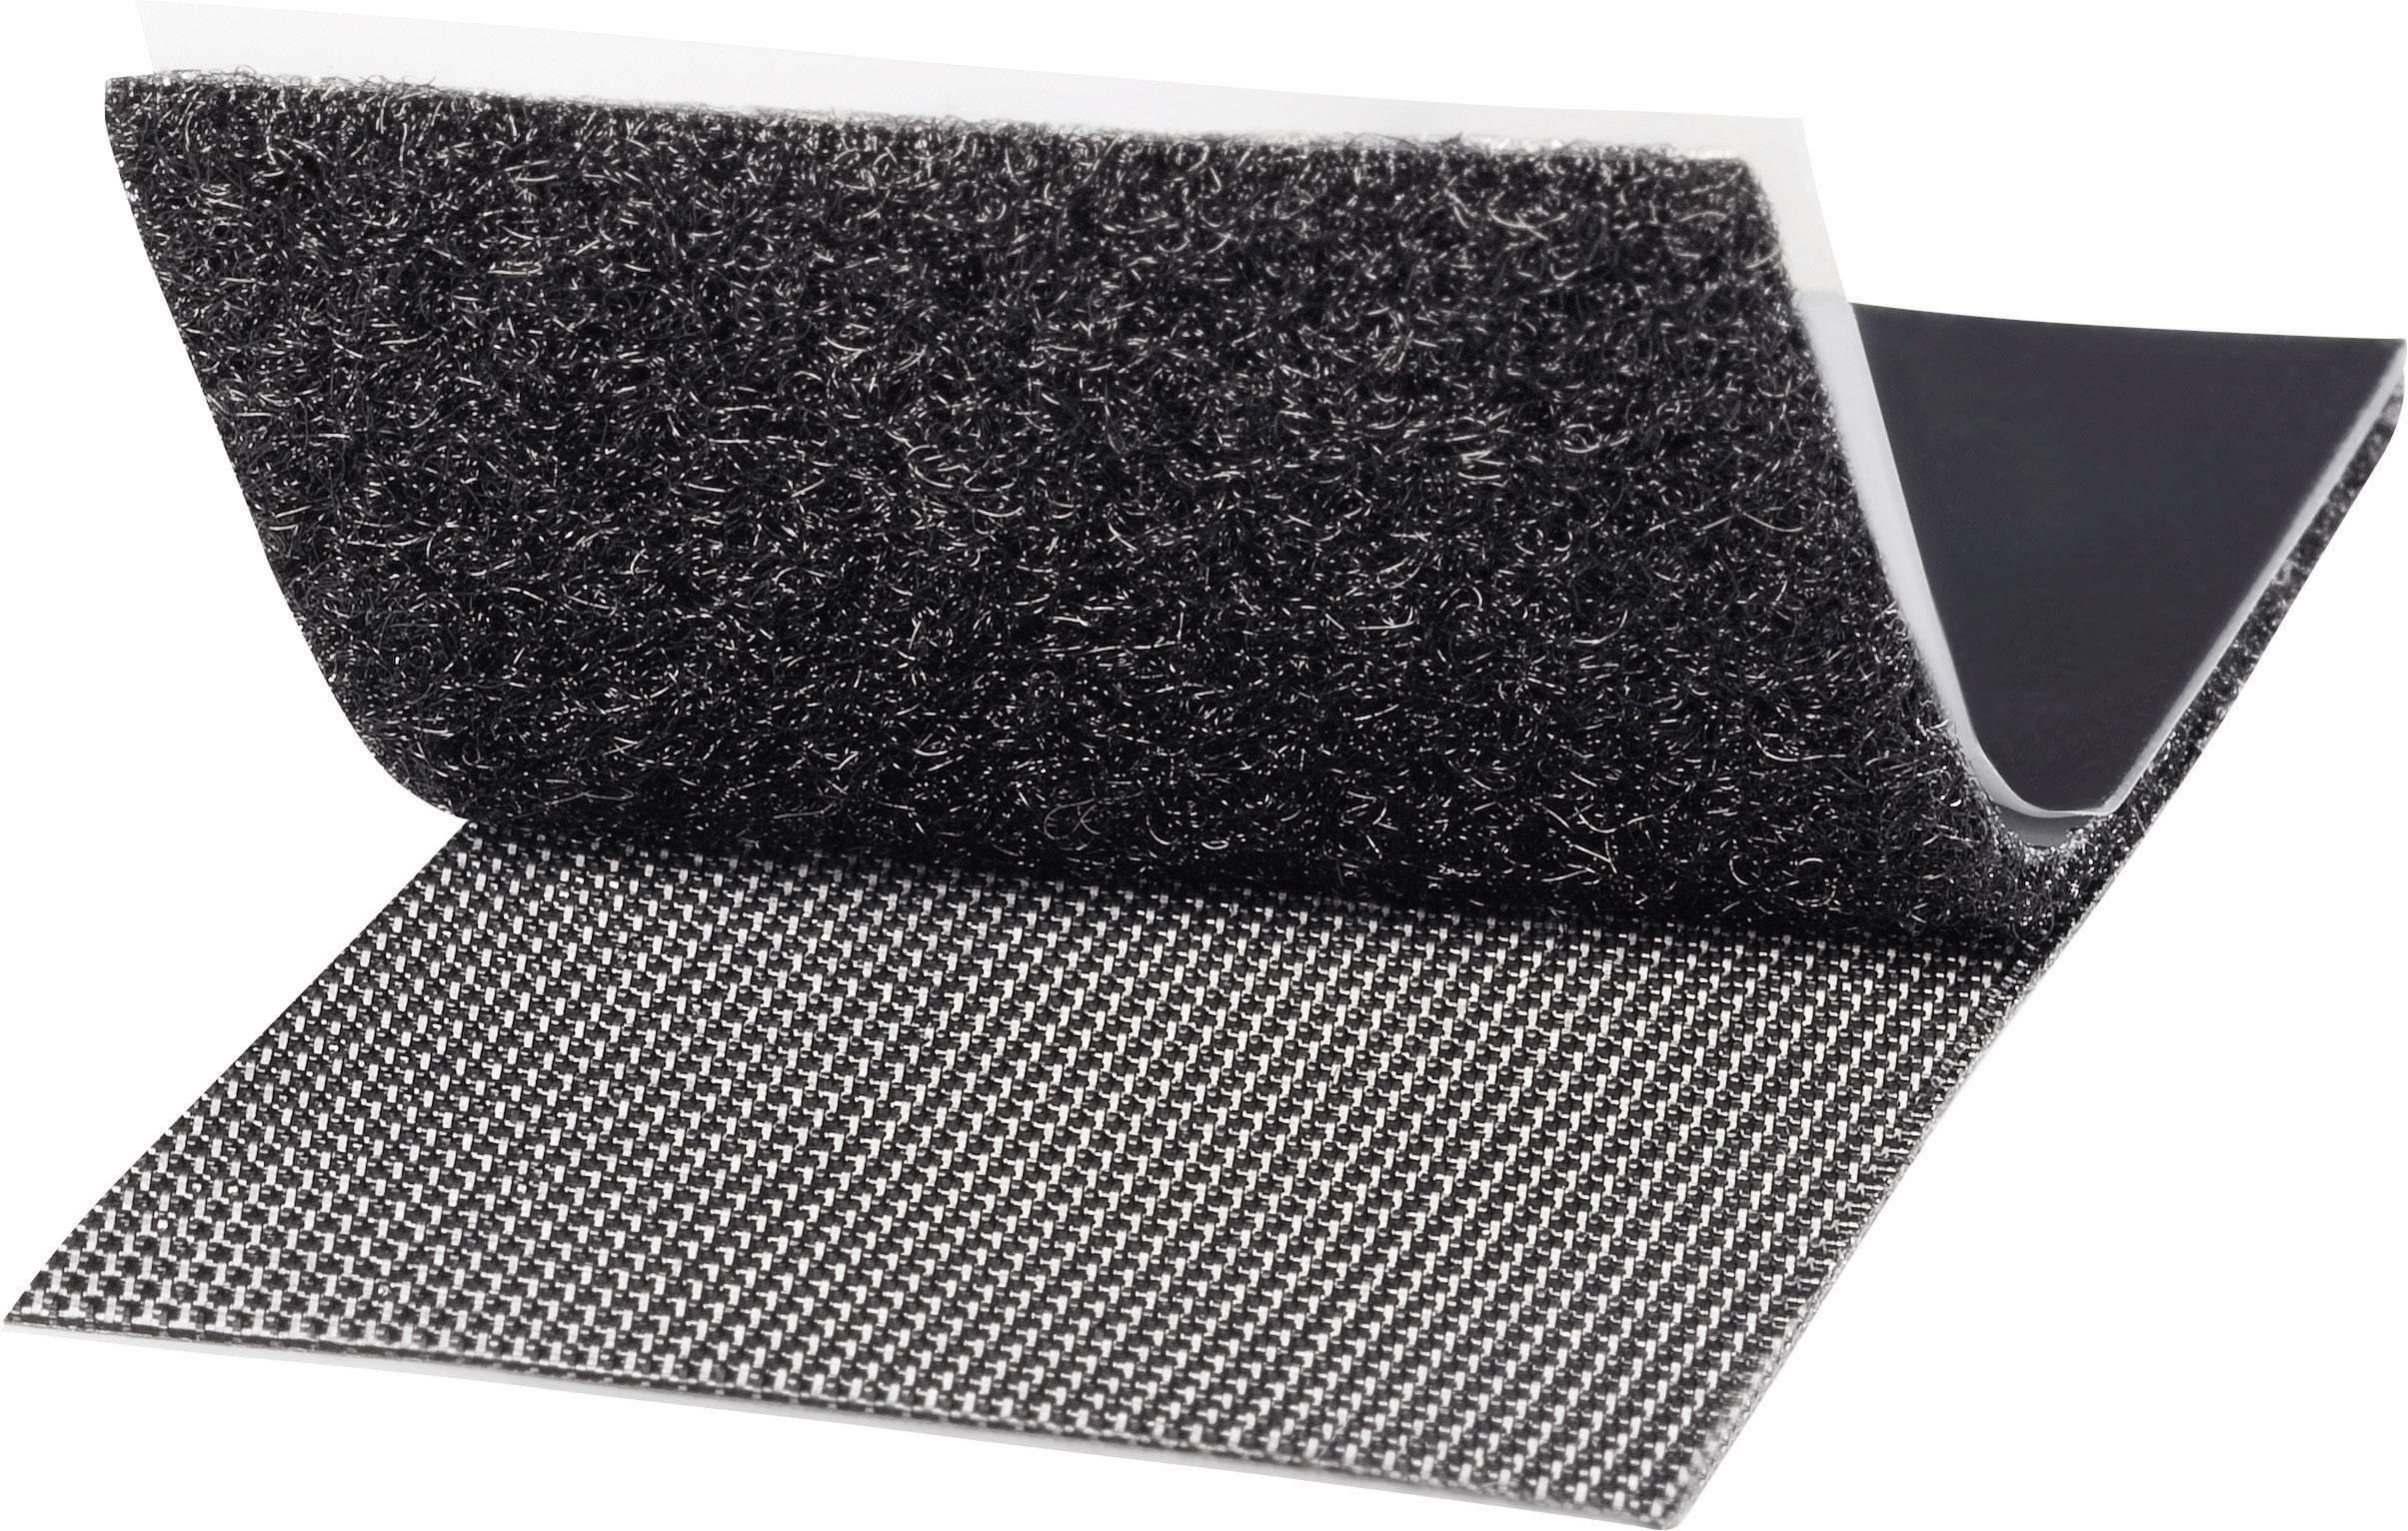 Lepicí pásek se suchým zipem TOOLCRAFT KL50X100SC KL50X100SC, (d x š) 100 mm x 50 mm, černá, 1 pár